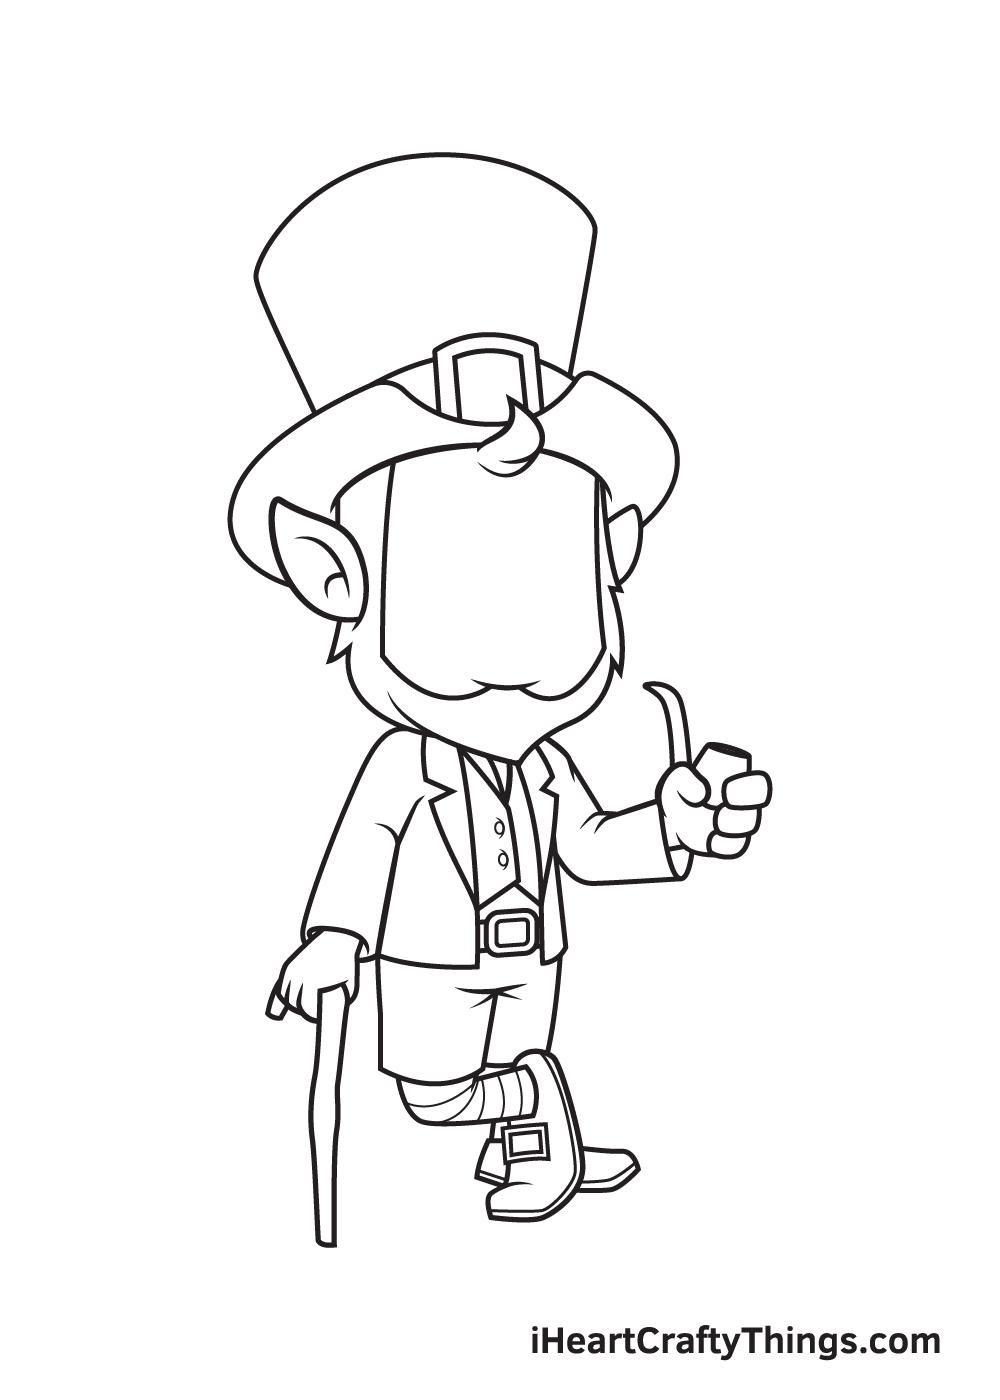 Leprechaun Drawing – Step 6